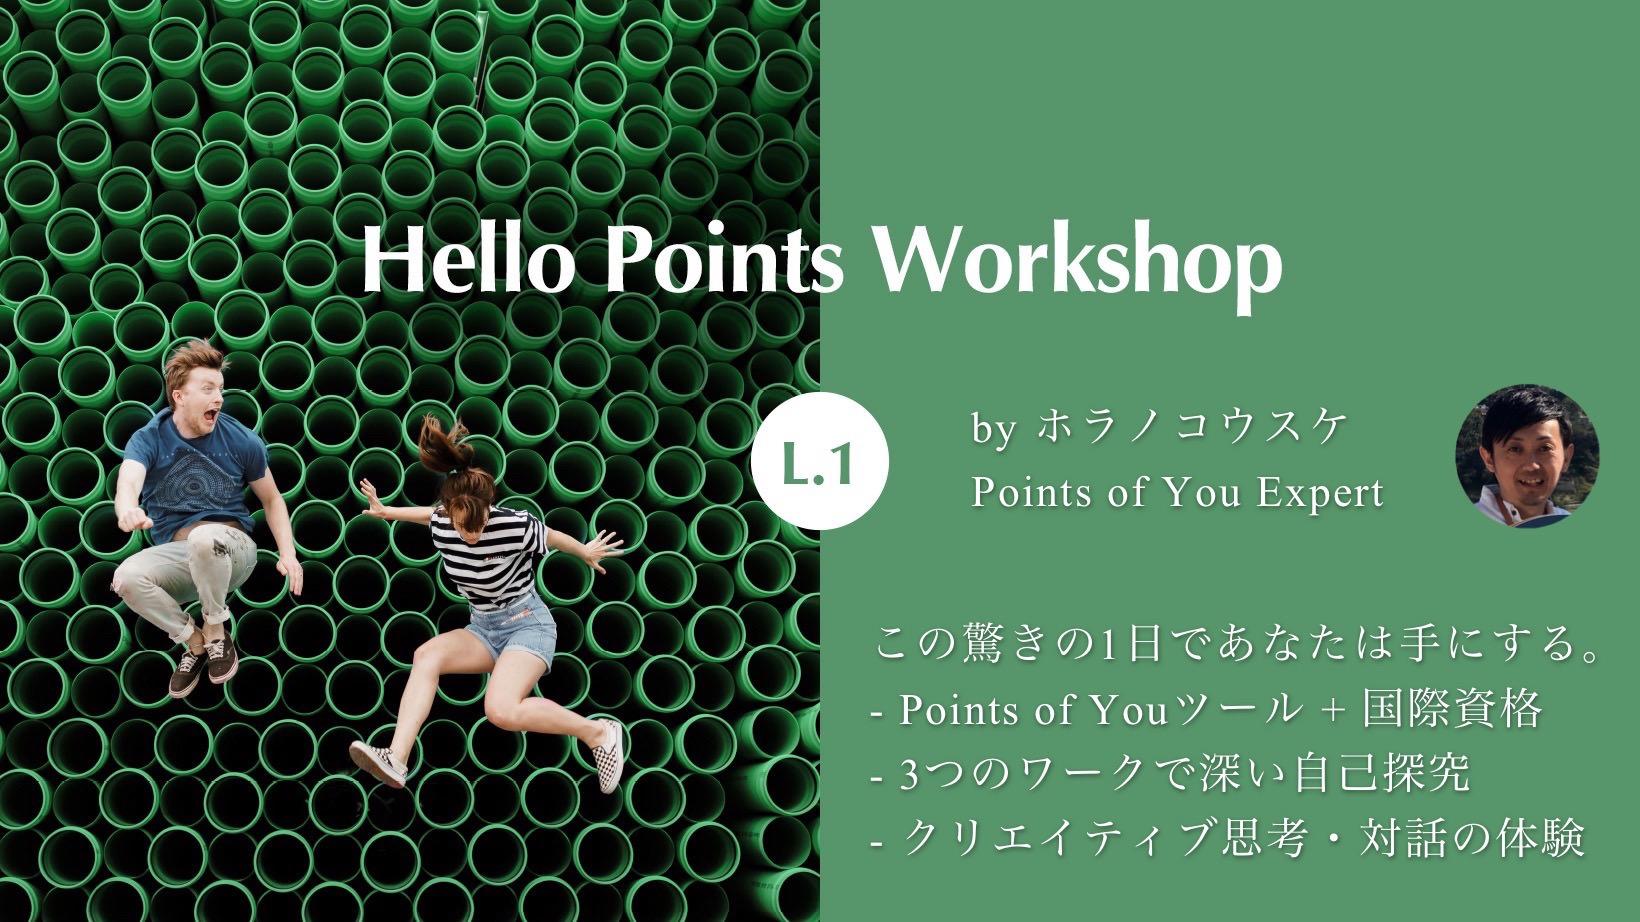 Points of YouホラノコウスケL1資格認定講座